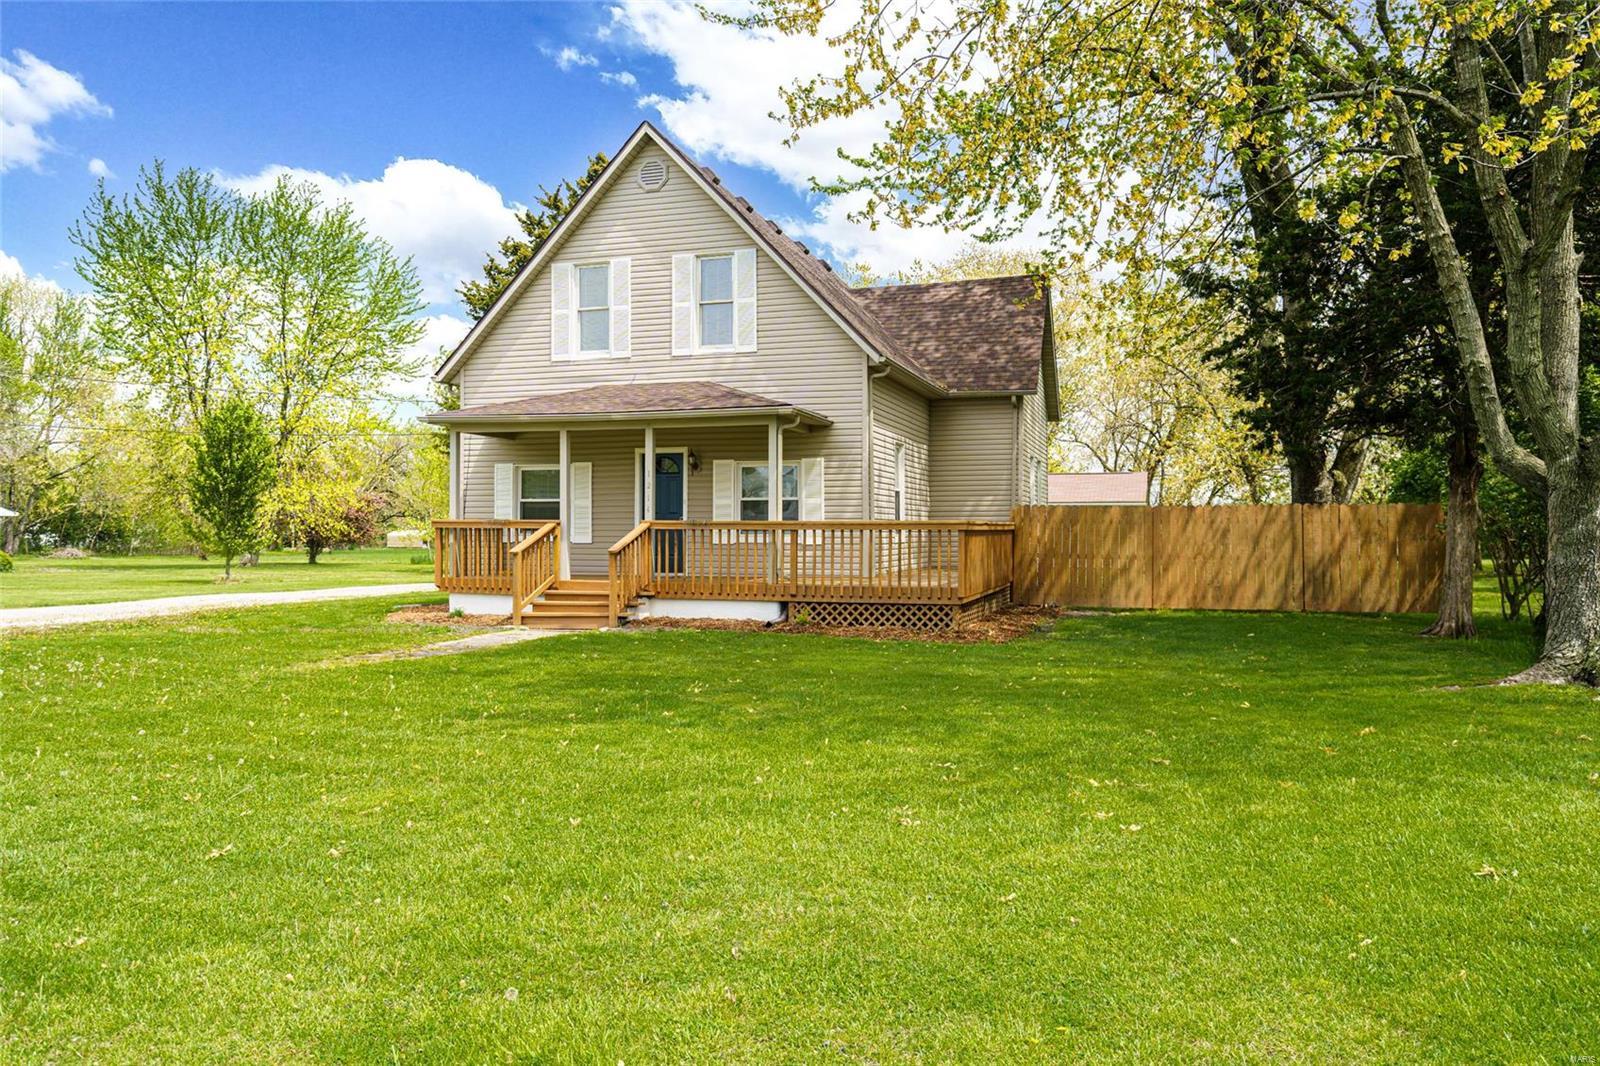 1214 S Van Buren Street Property Photo - Litchfield, IL real estate listing